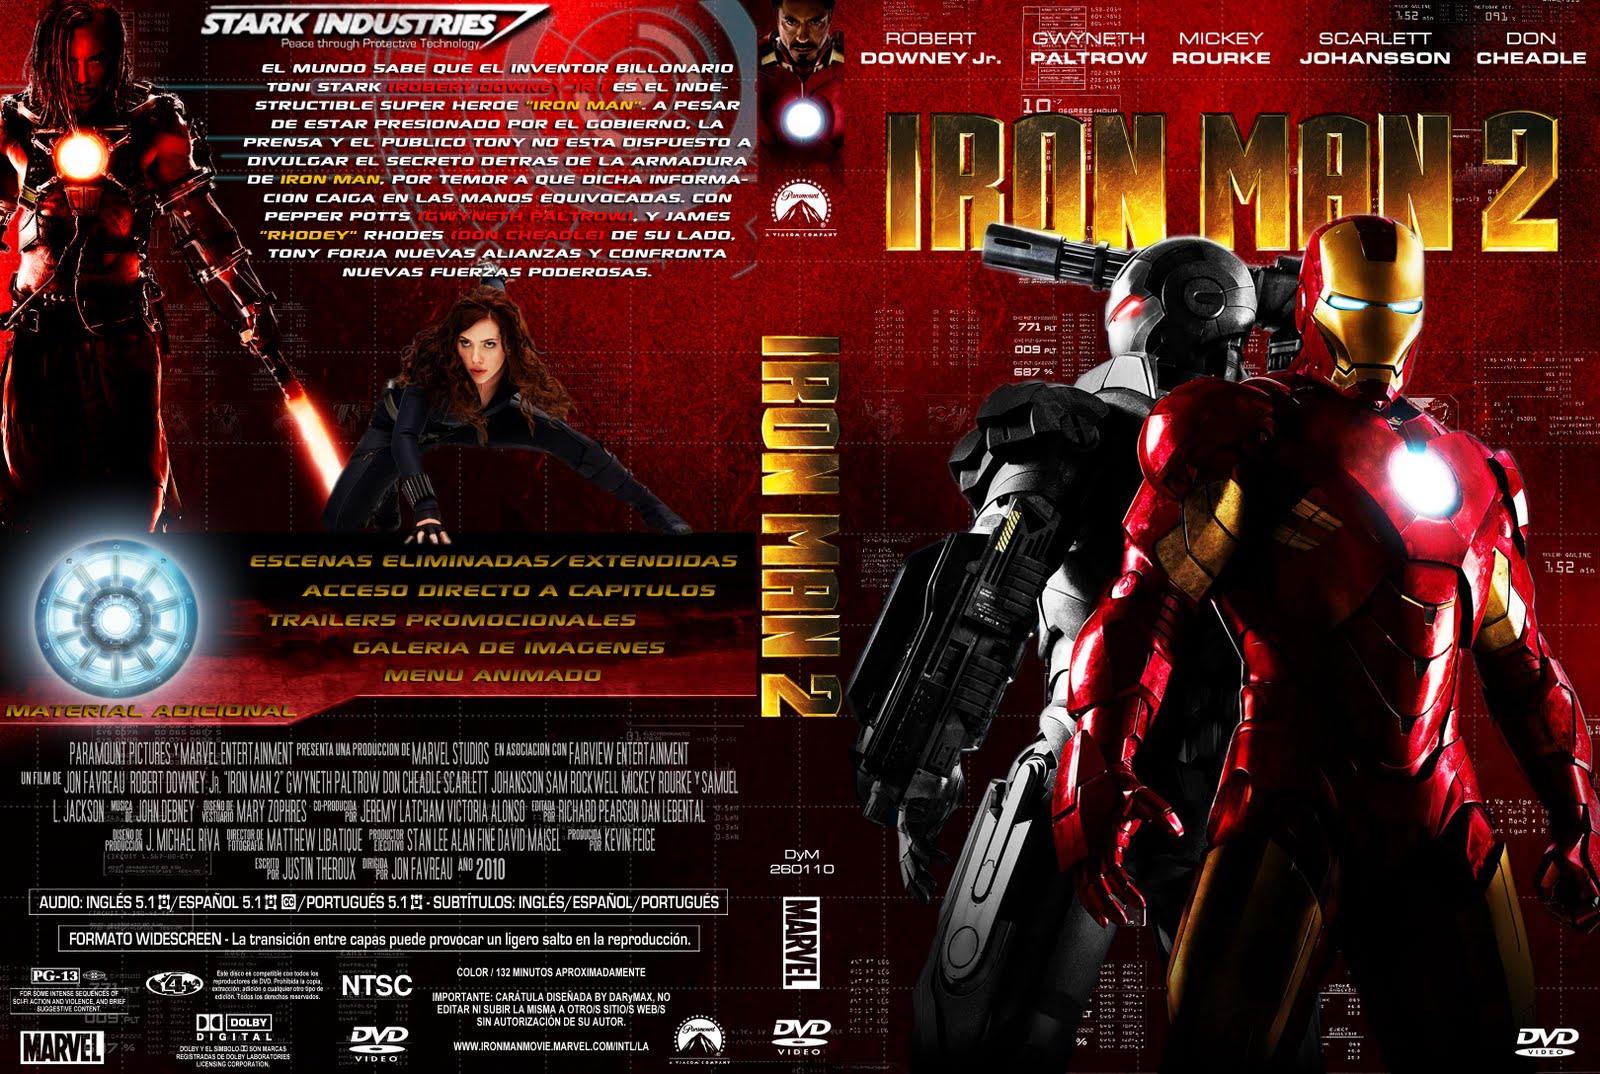 Descargar Iron Man 4 A2zp30: Beta Pics: August 2010